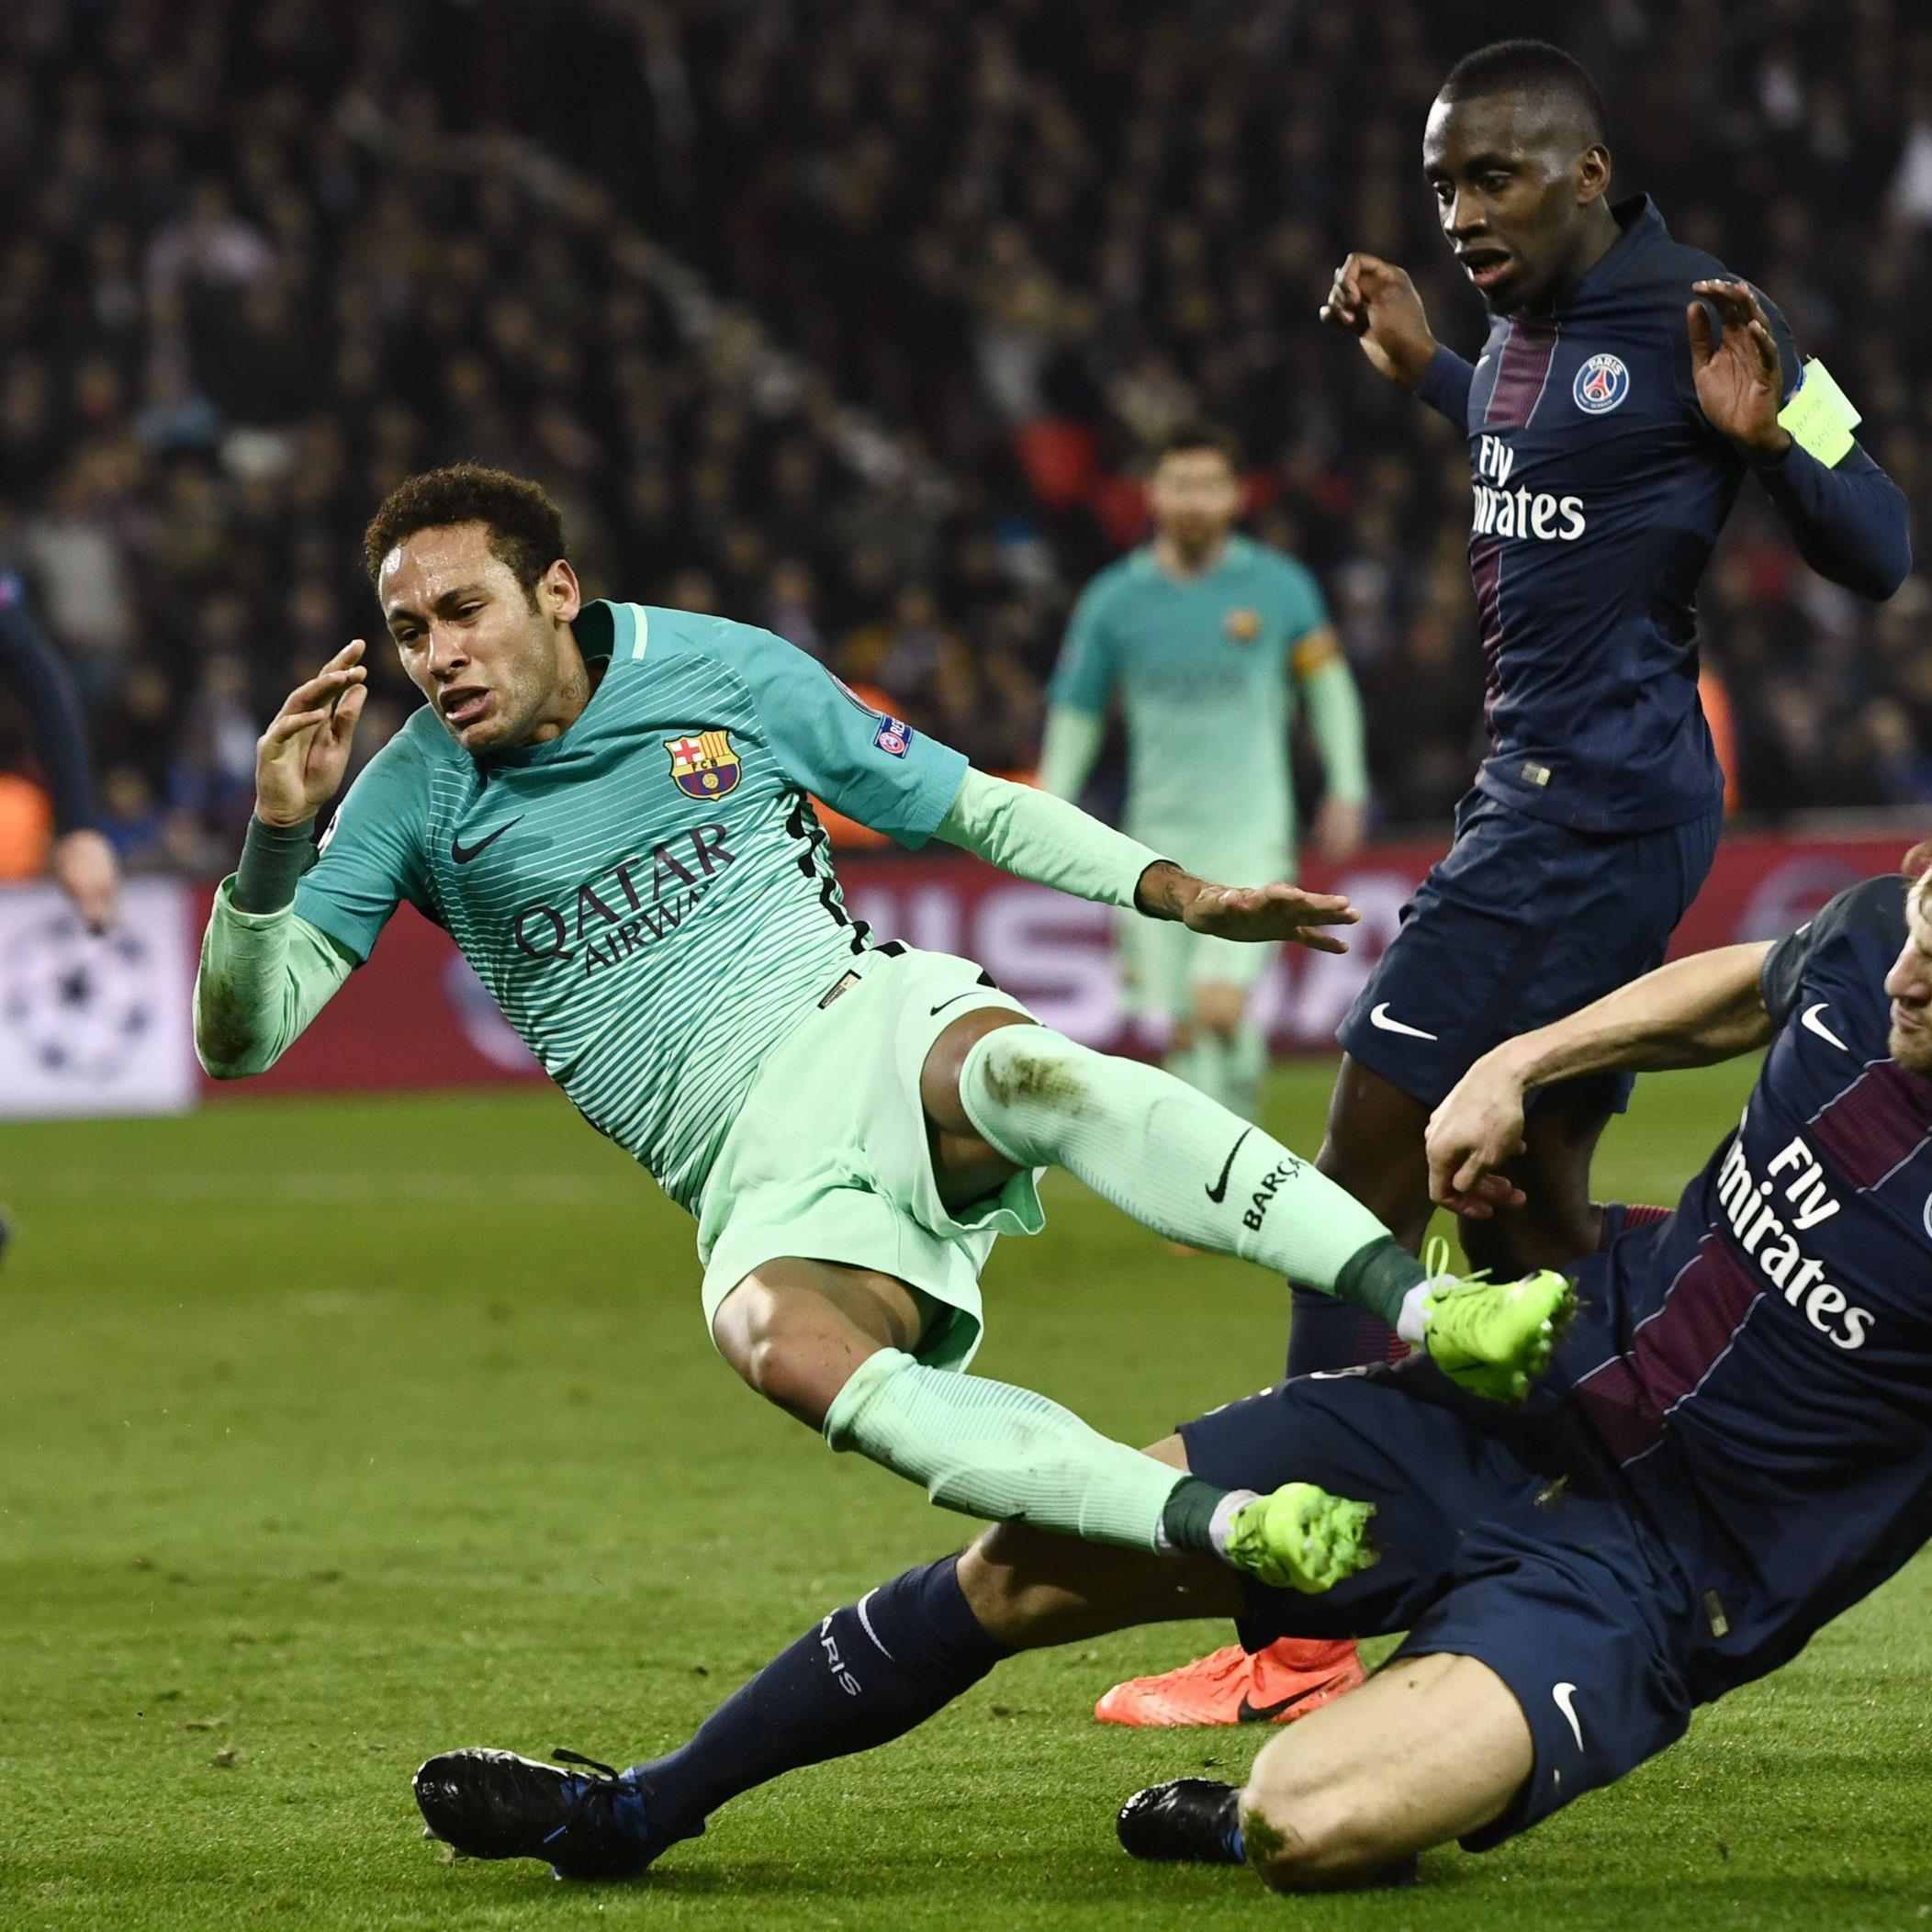 Der FC Barcelona hofft gegen PSG auf das Wunder vom Camp Nou.